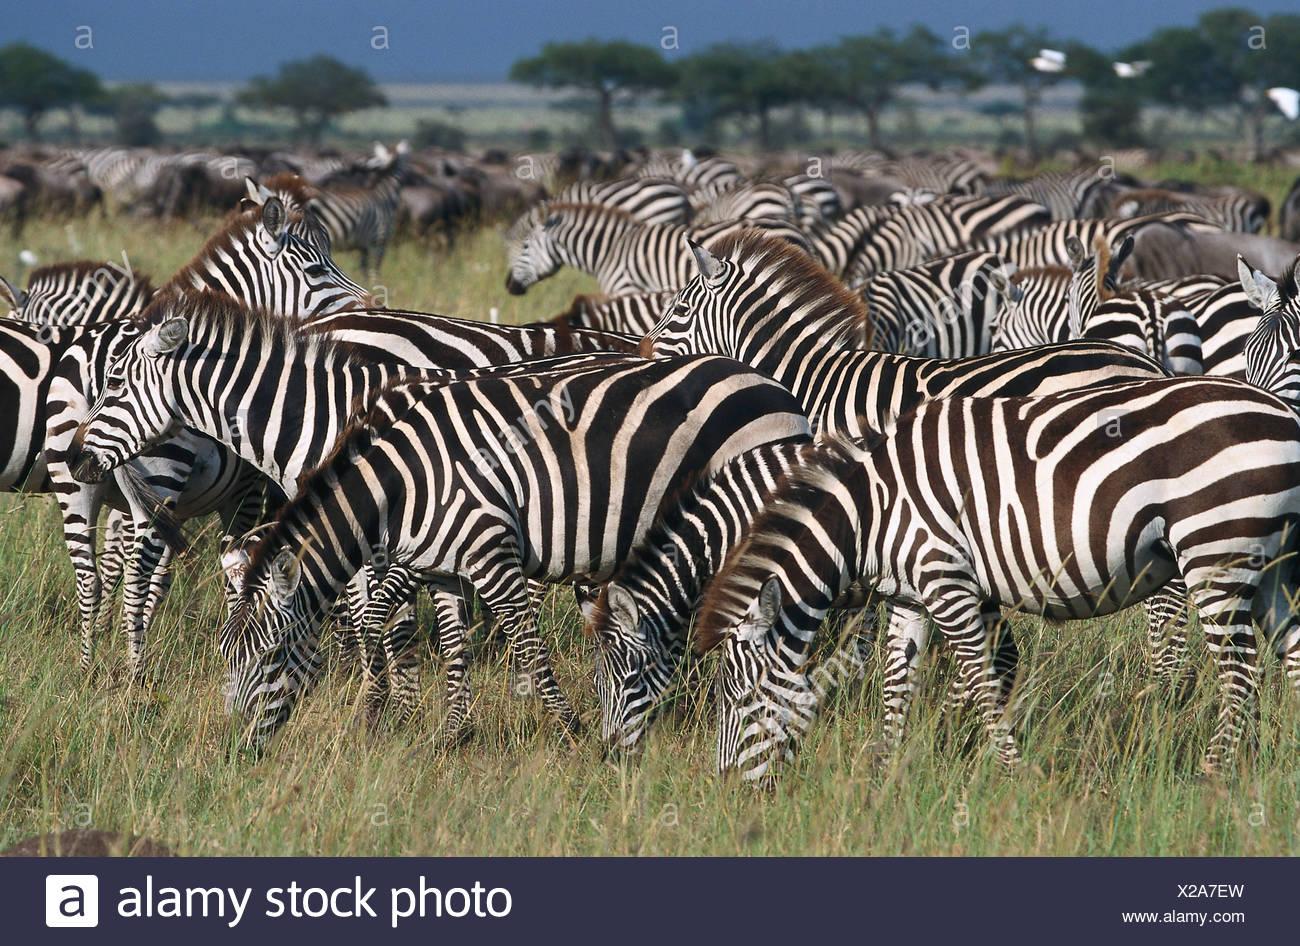 Zebras, Serengeti NP Tansania - Stock Image